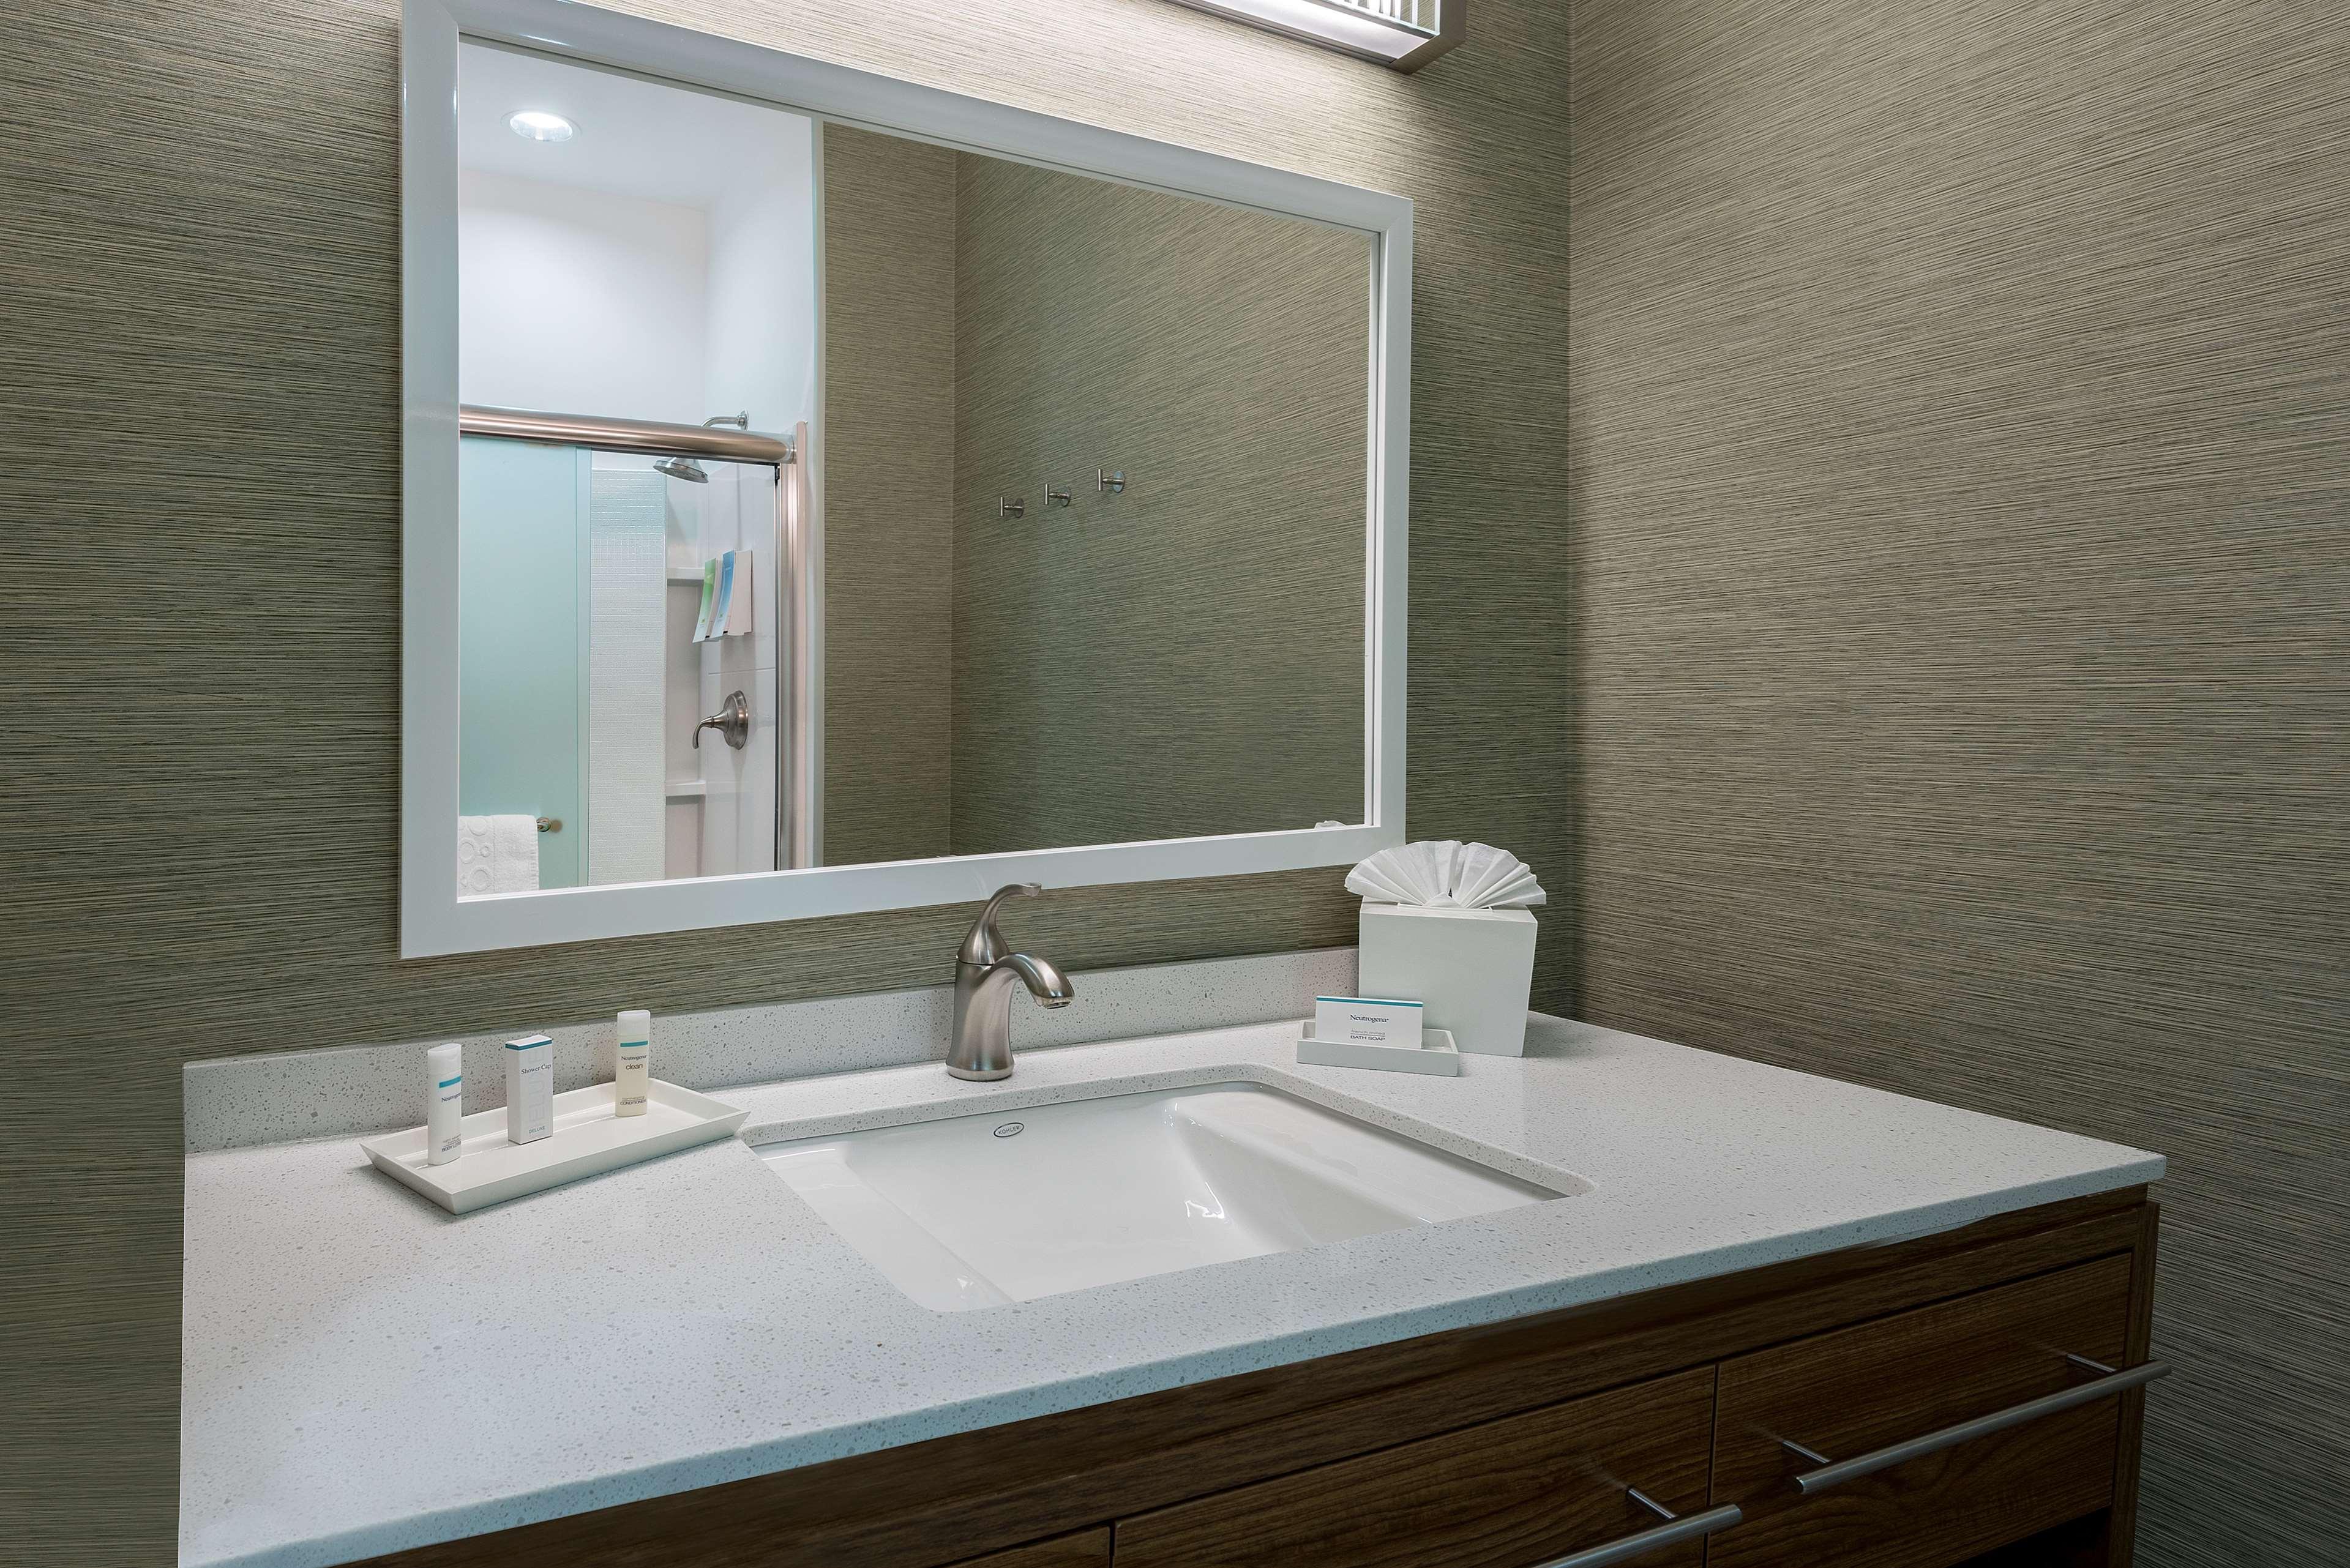 Home2 Suites by Hilton Austin Airport image 29